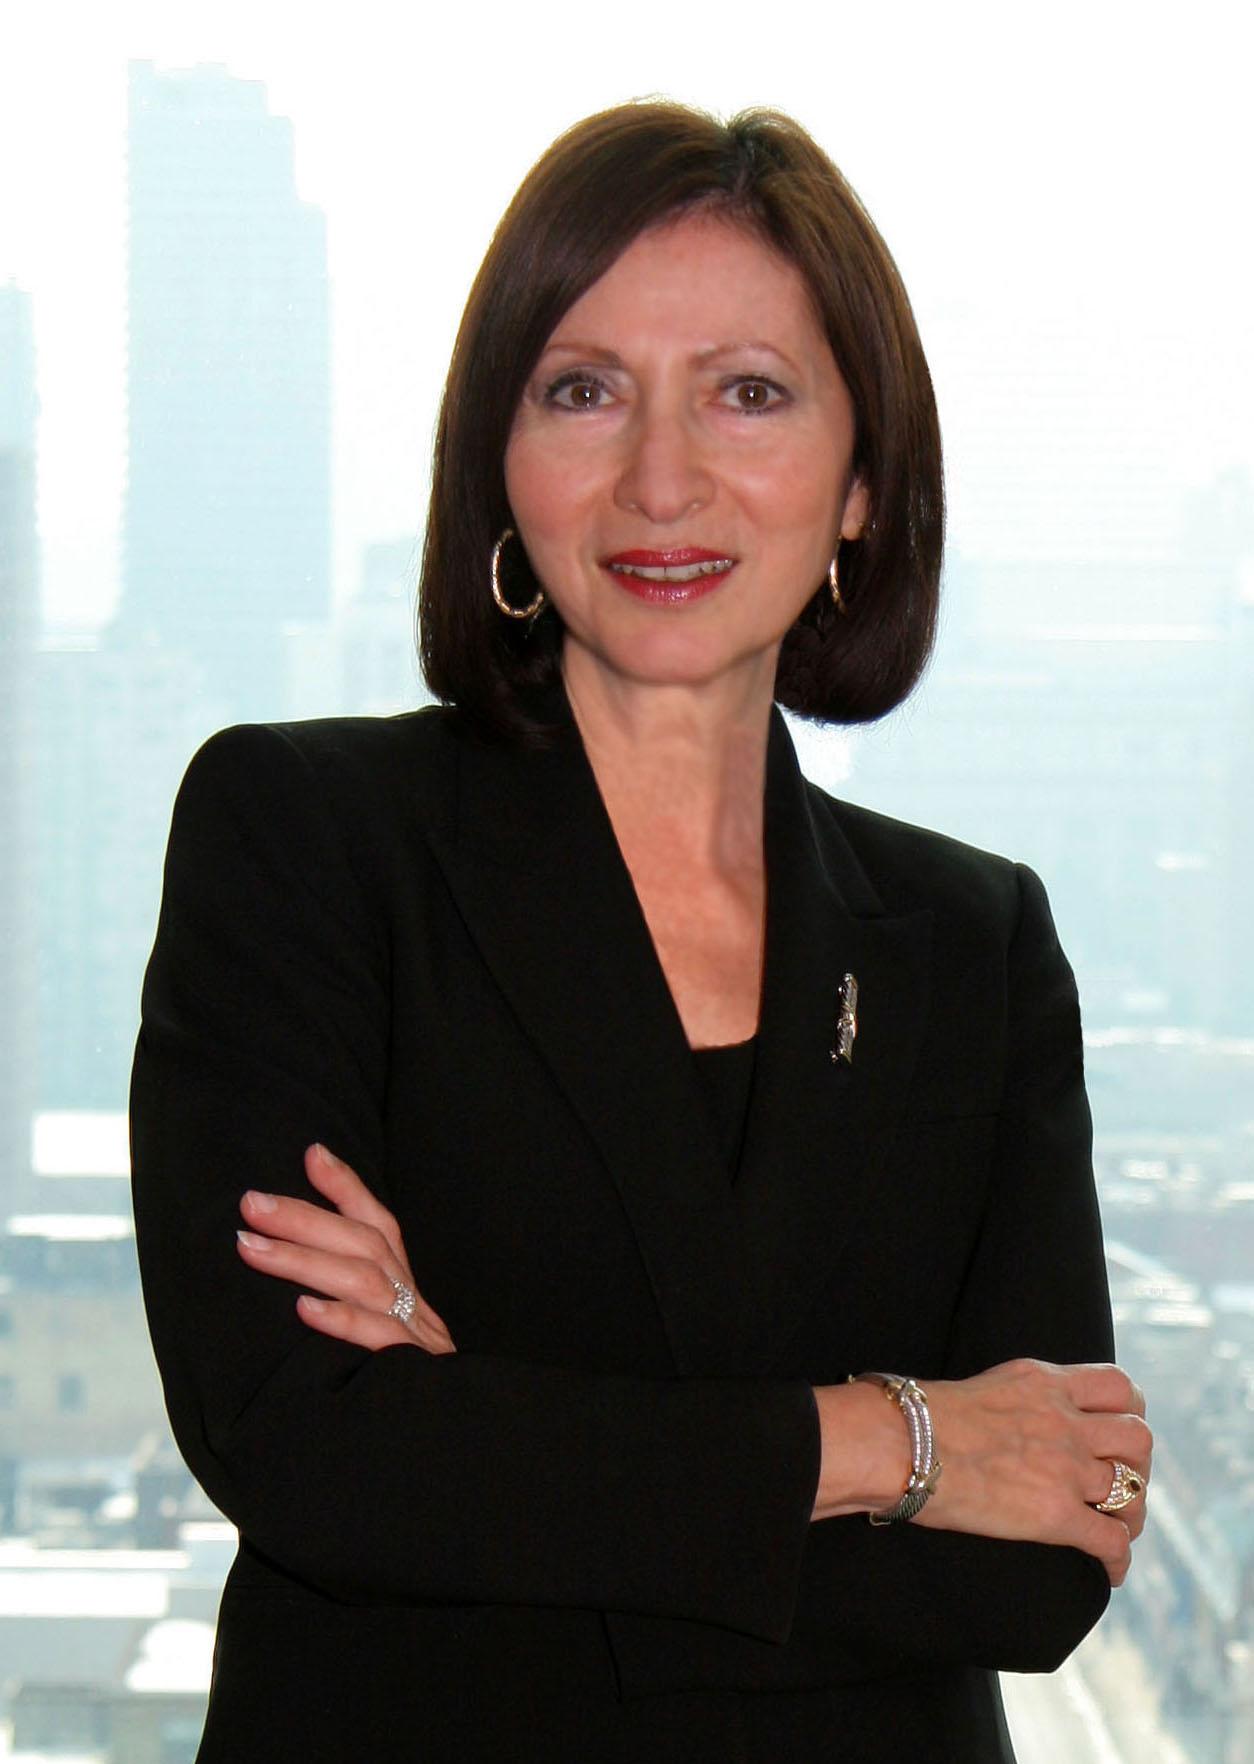 Ann Cavoukian, Ph.D